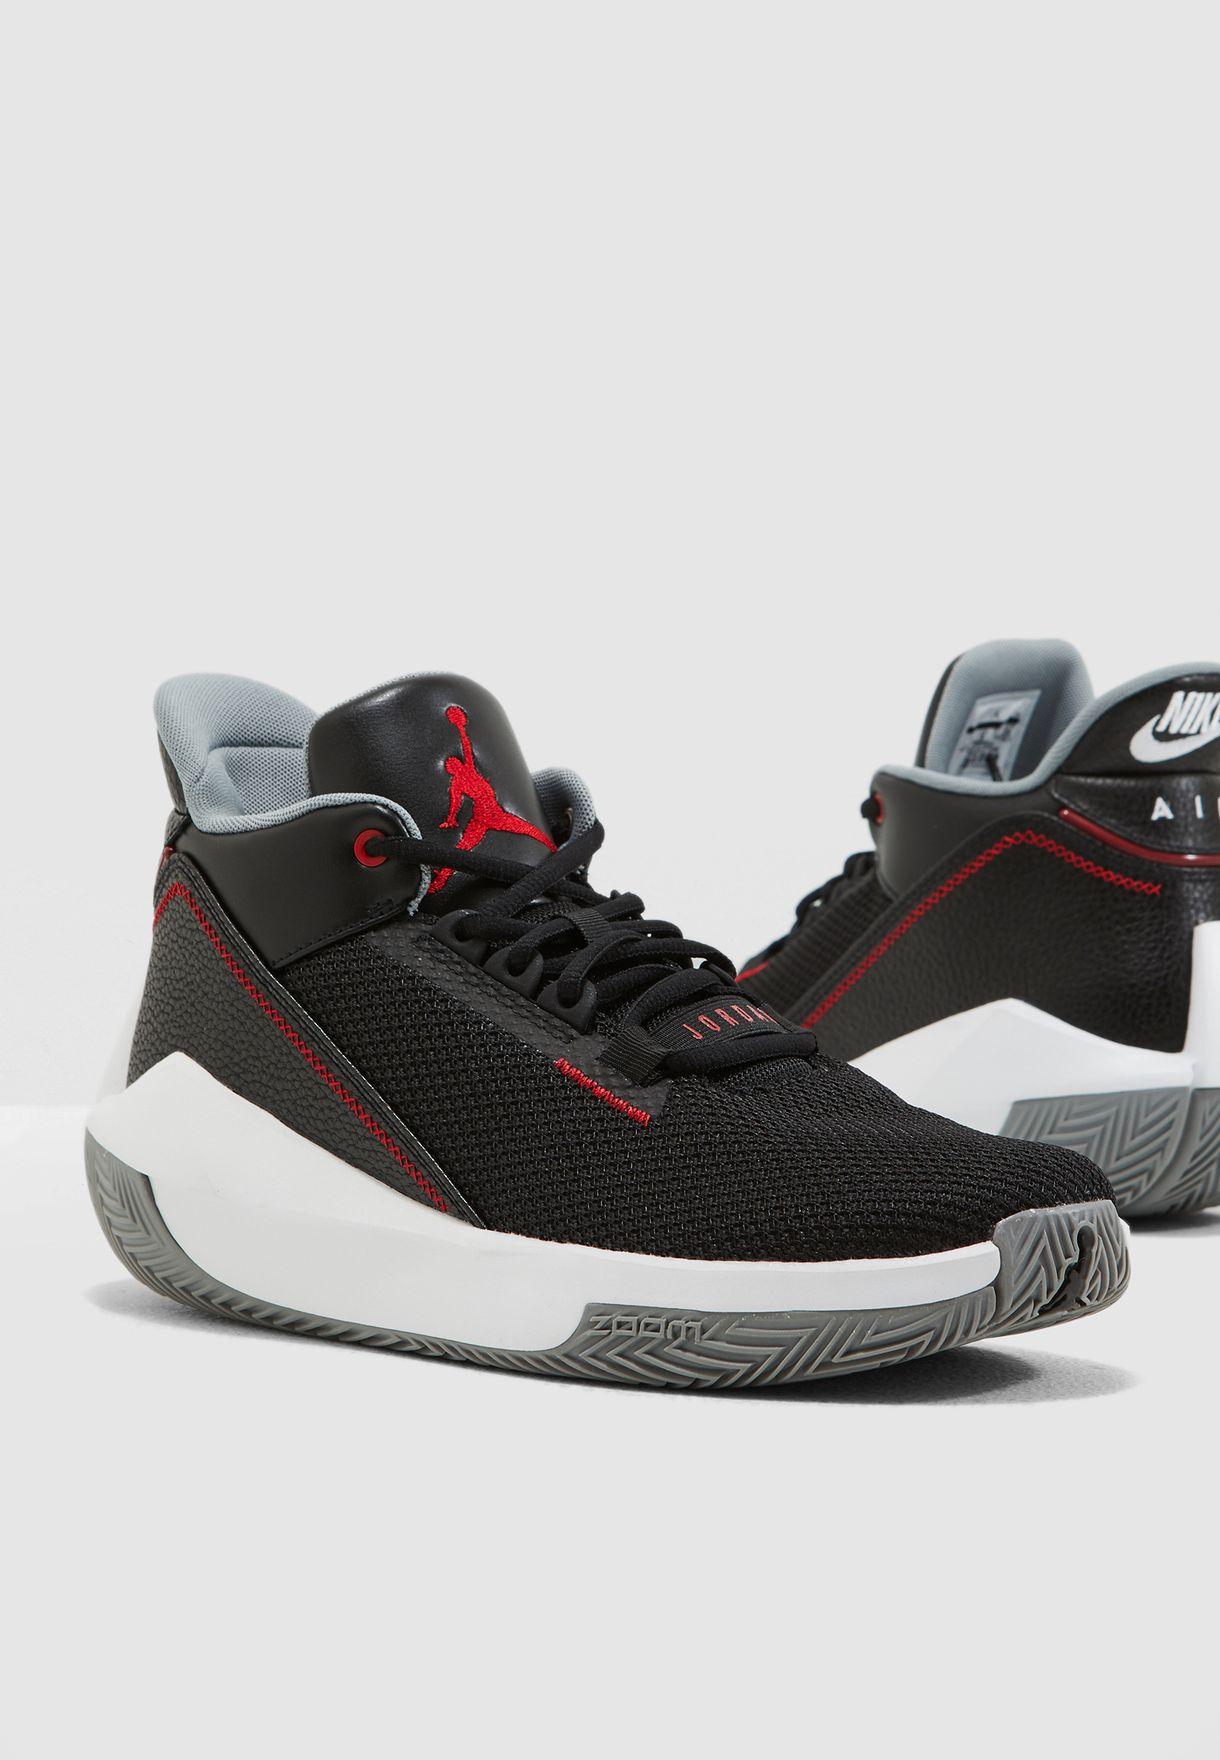 jordan 2 x 3 shoes